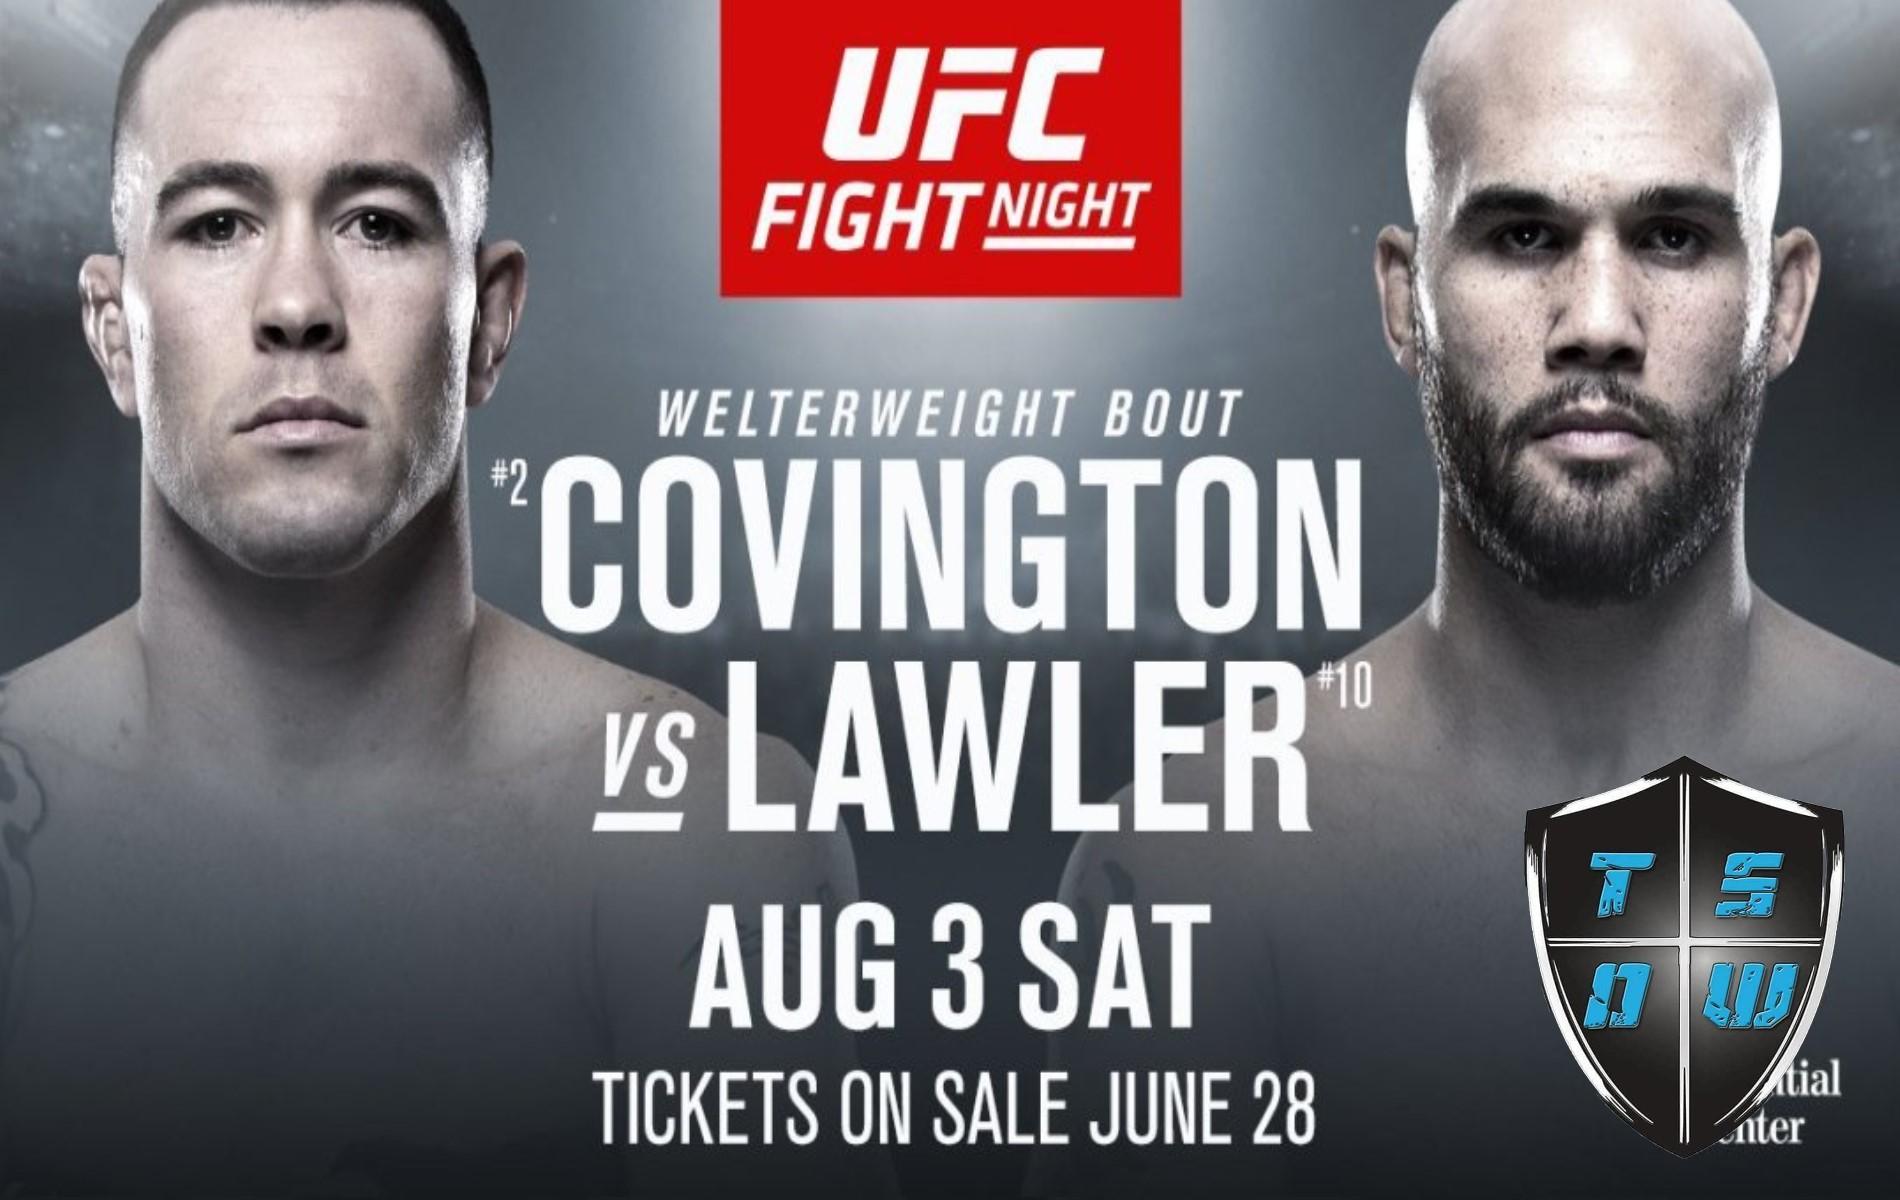 UFC Newark: Covington vs Lawler